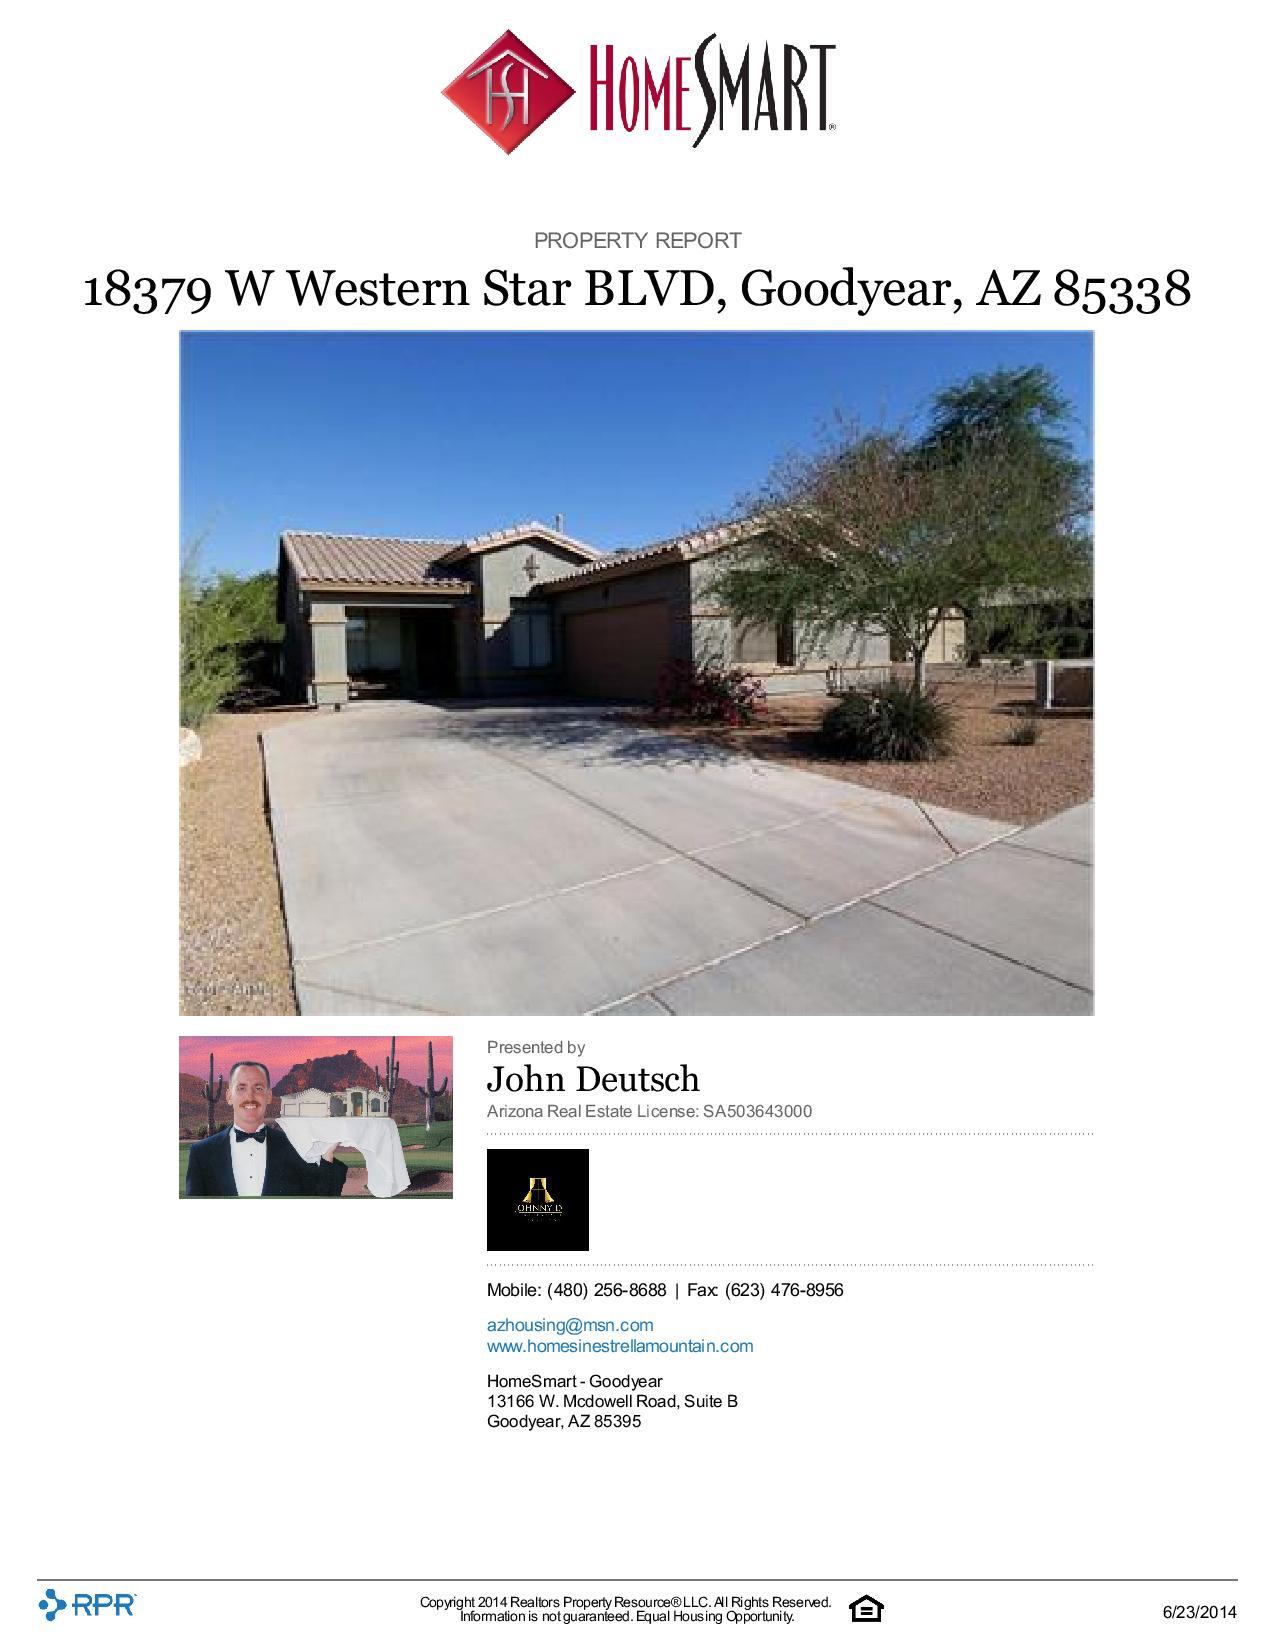 18379-W-Western-Star-BLVD-Goodyear-AZ-85338-page-001